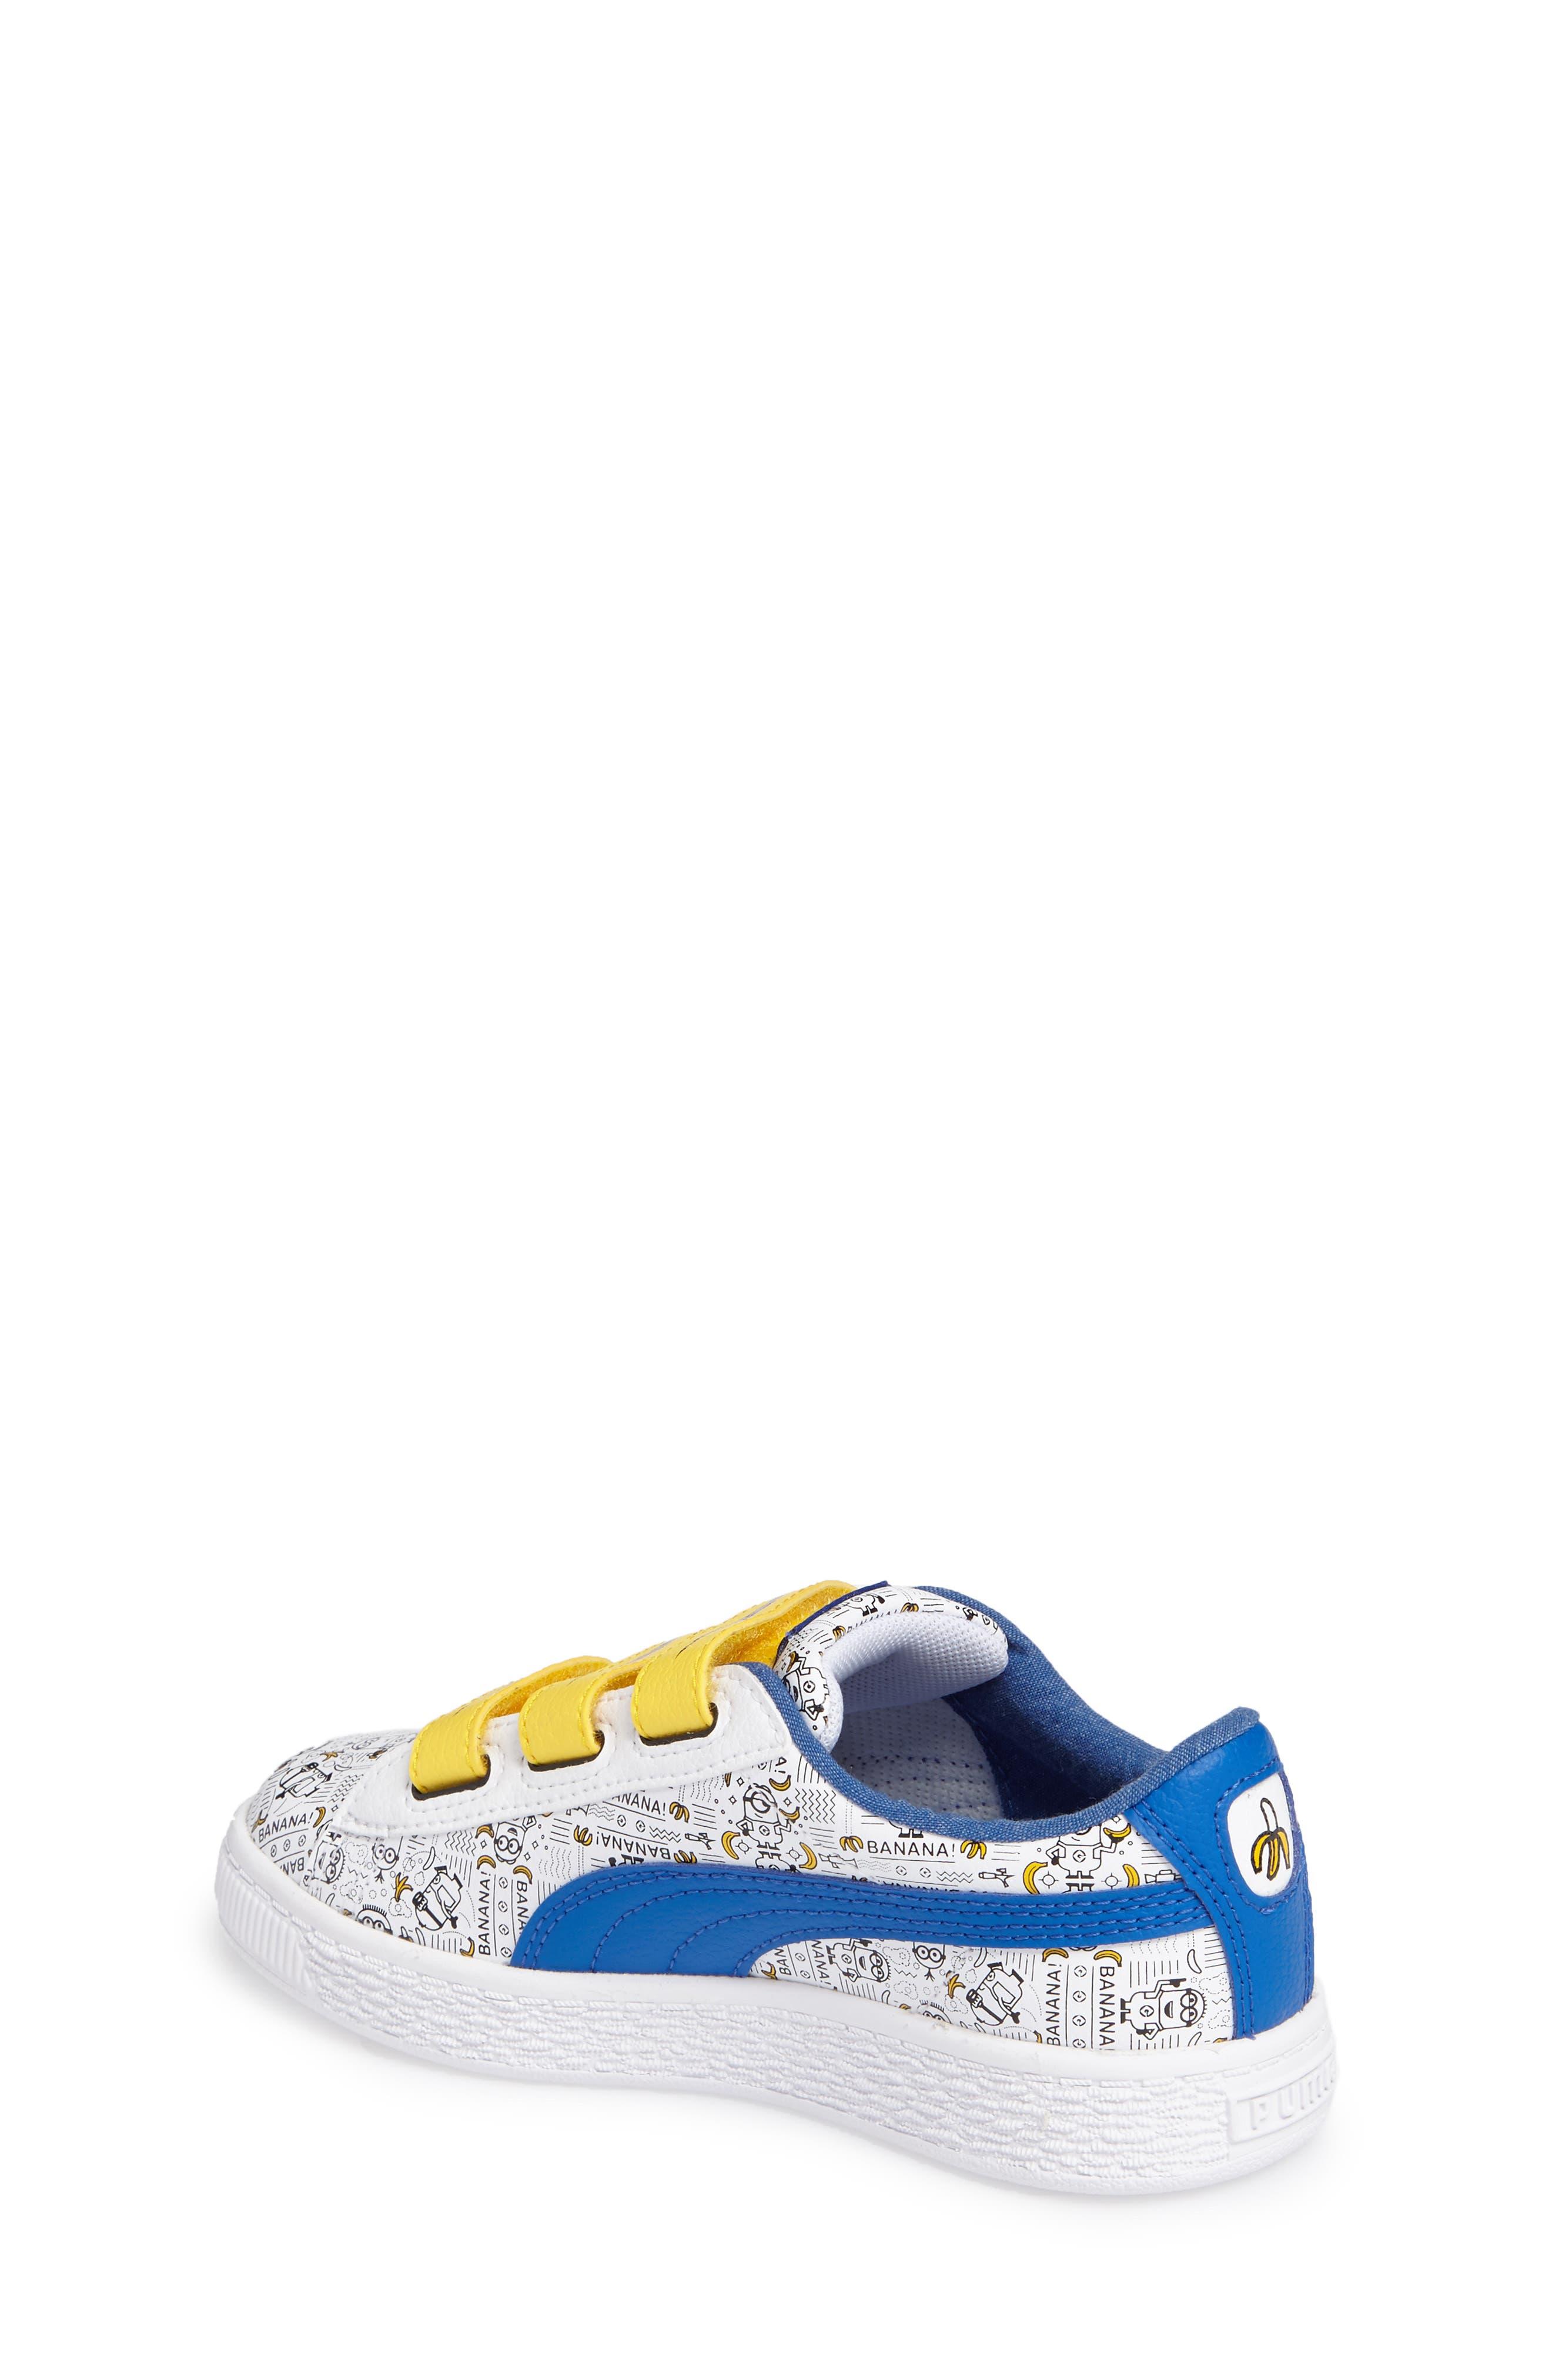 Minions Basket V Sneaker,                             Alternate thumbnail 2, color,                             100